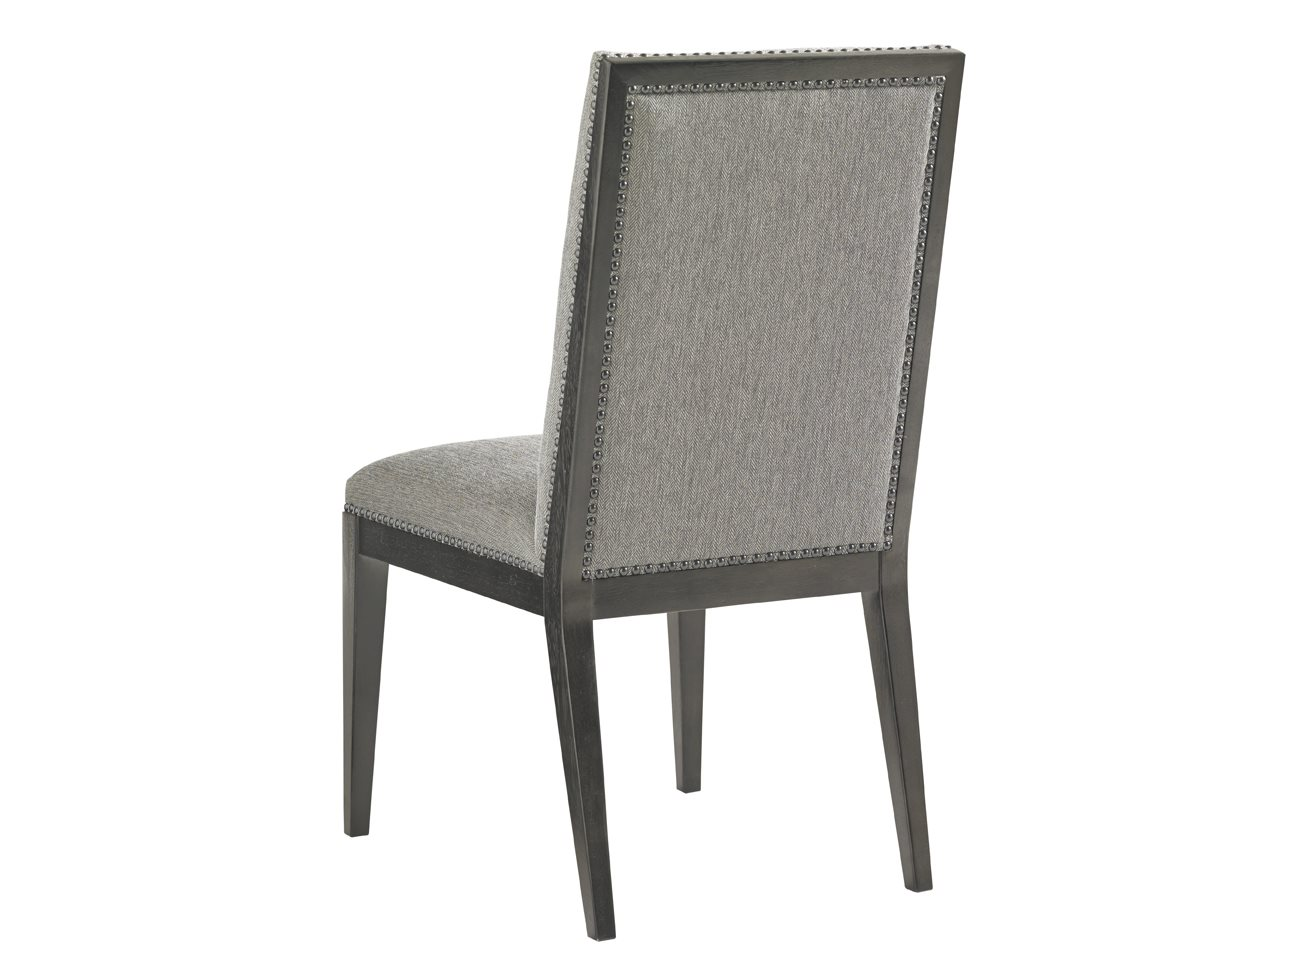 Lexington Carrera Carbon Gray Vantage Upholstered Dining